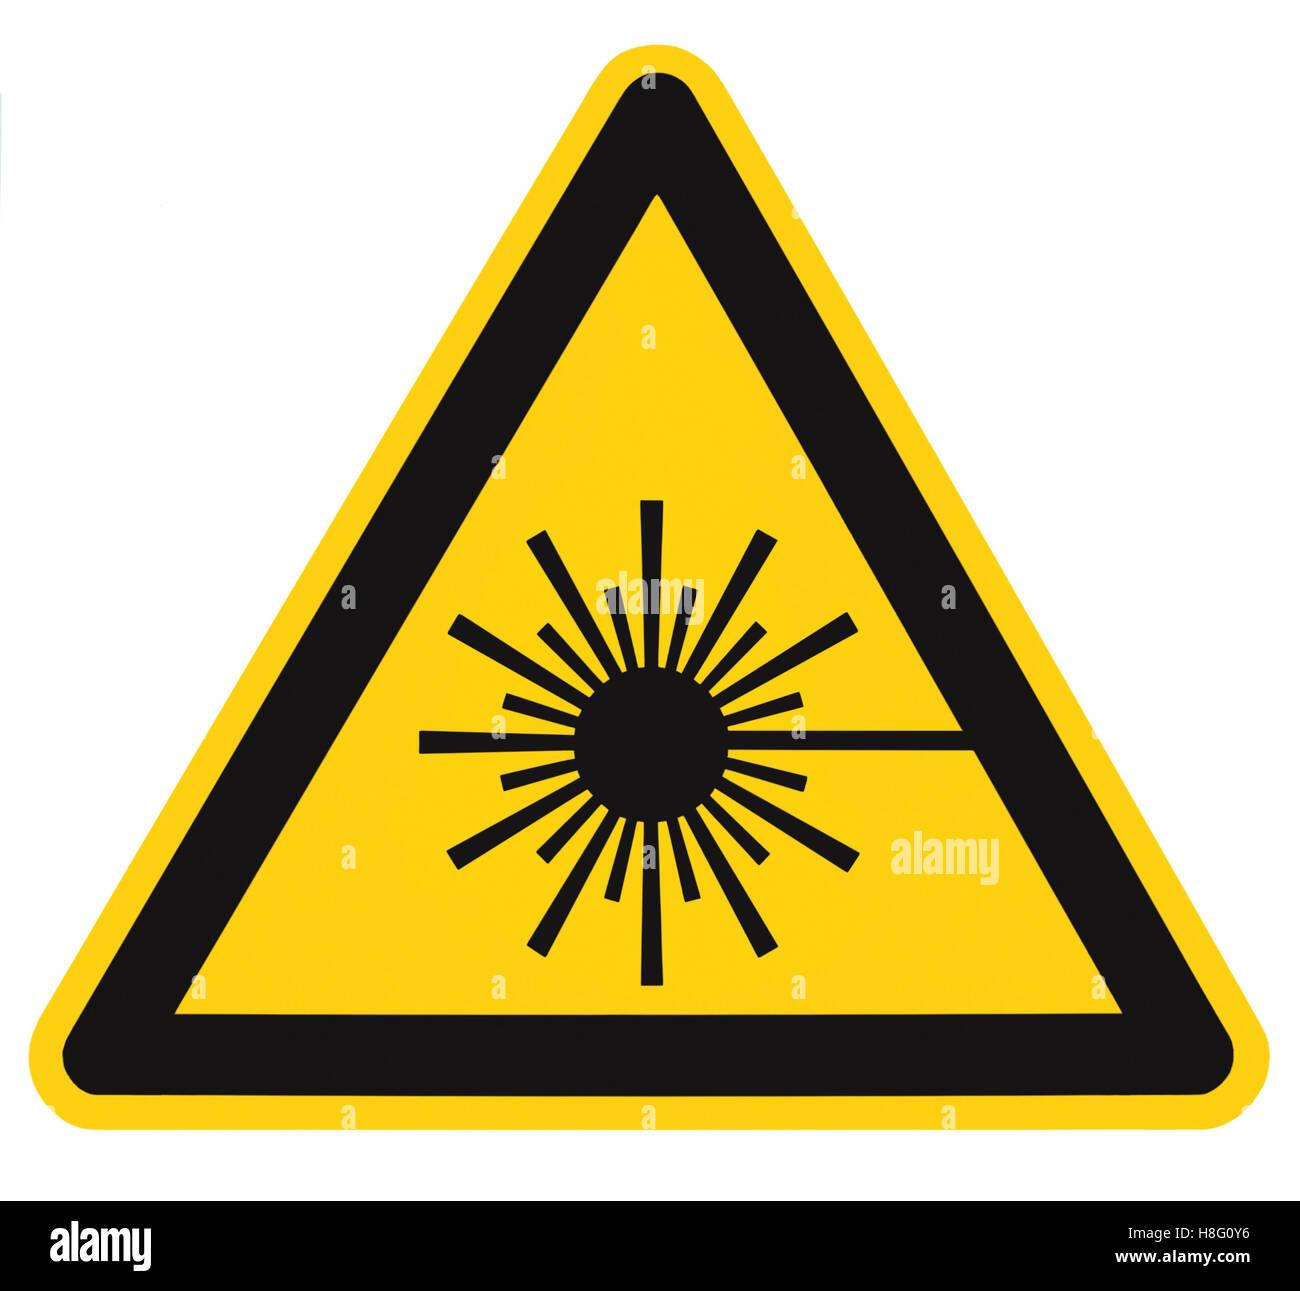 laser hazard sign stock photos laser hazard sign stock images alamy